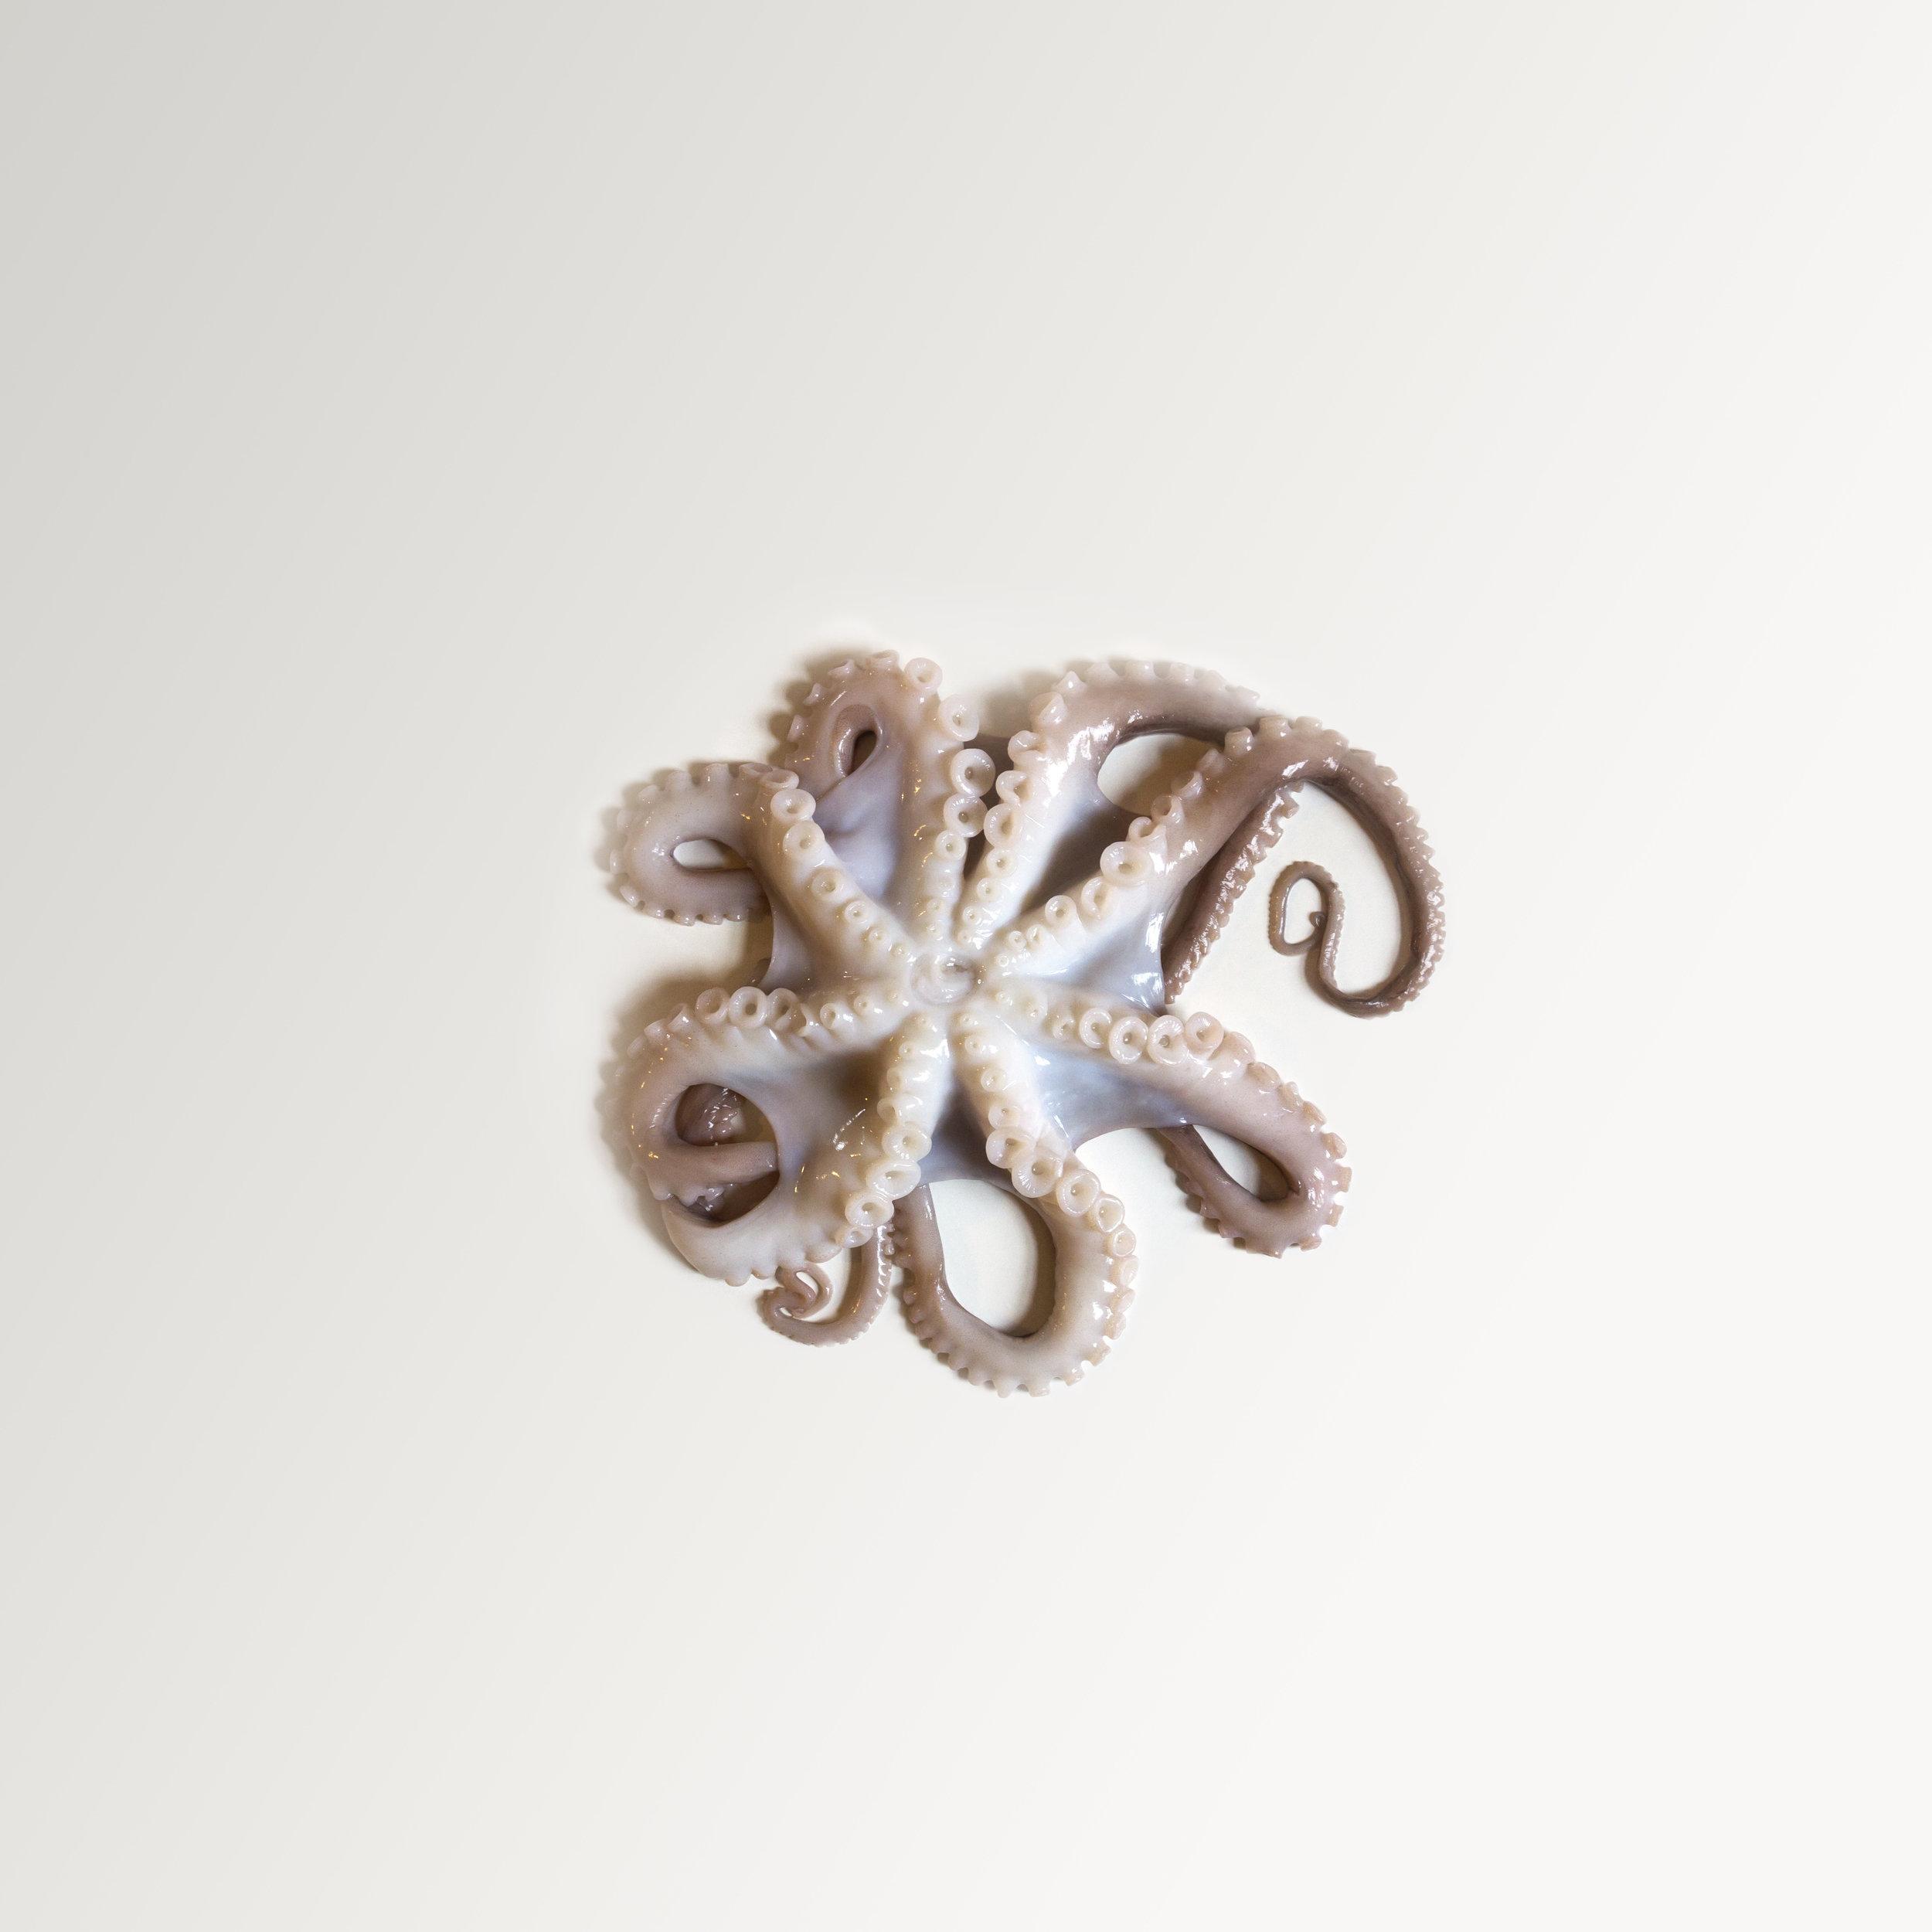 A simple, minimalist, contemporary, fine art photograph of an octopus